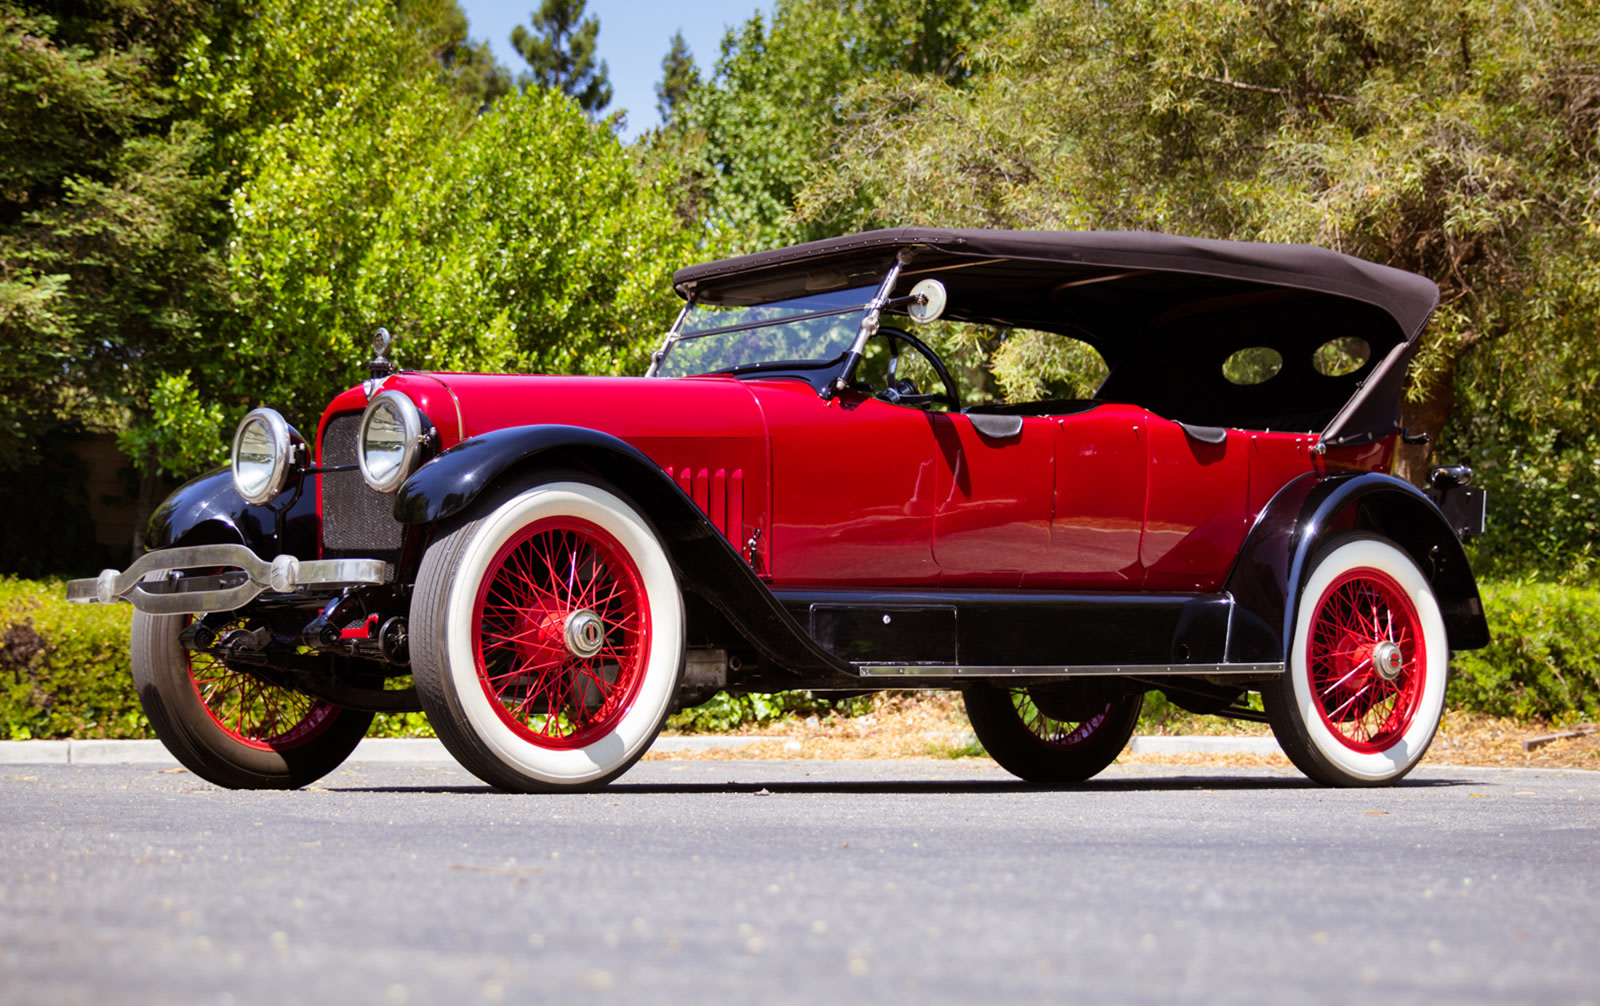 1921 Mercer Series 5 Sporting